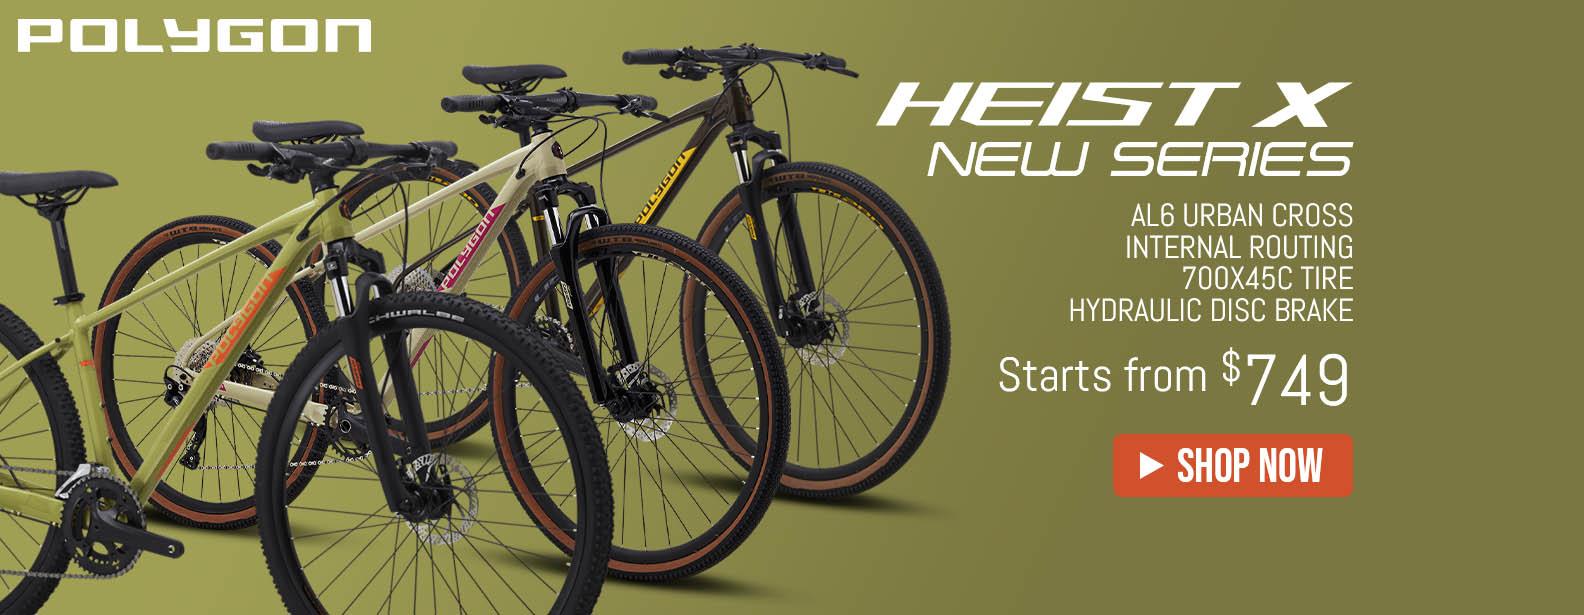 Polygon New Heist X Series